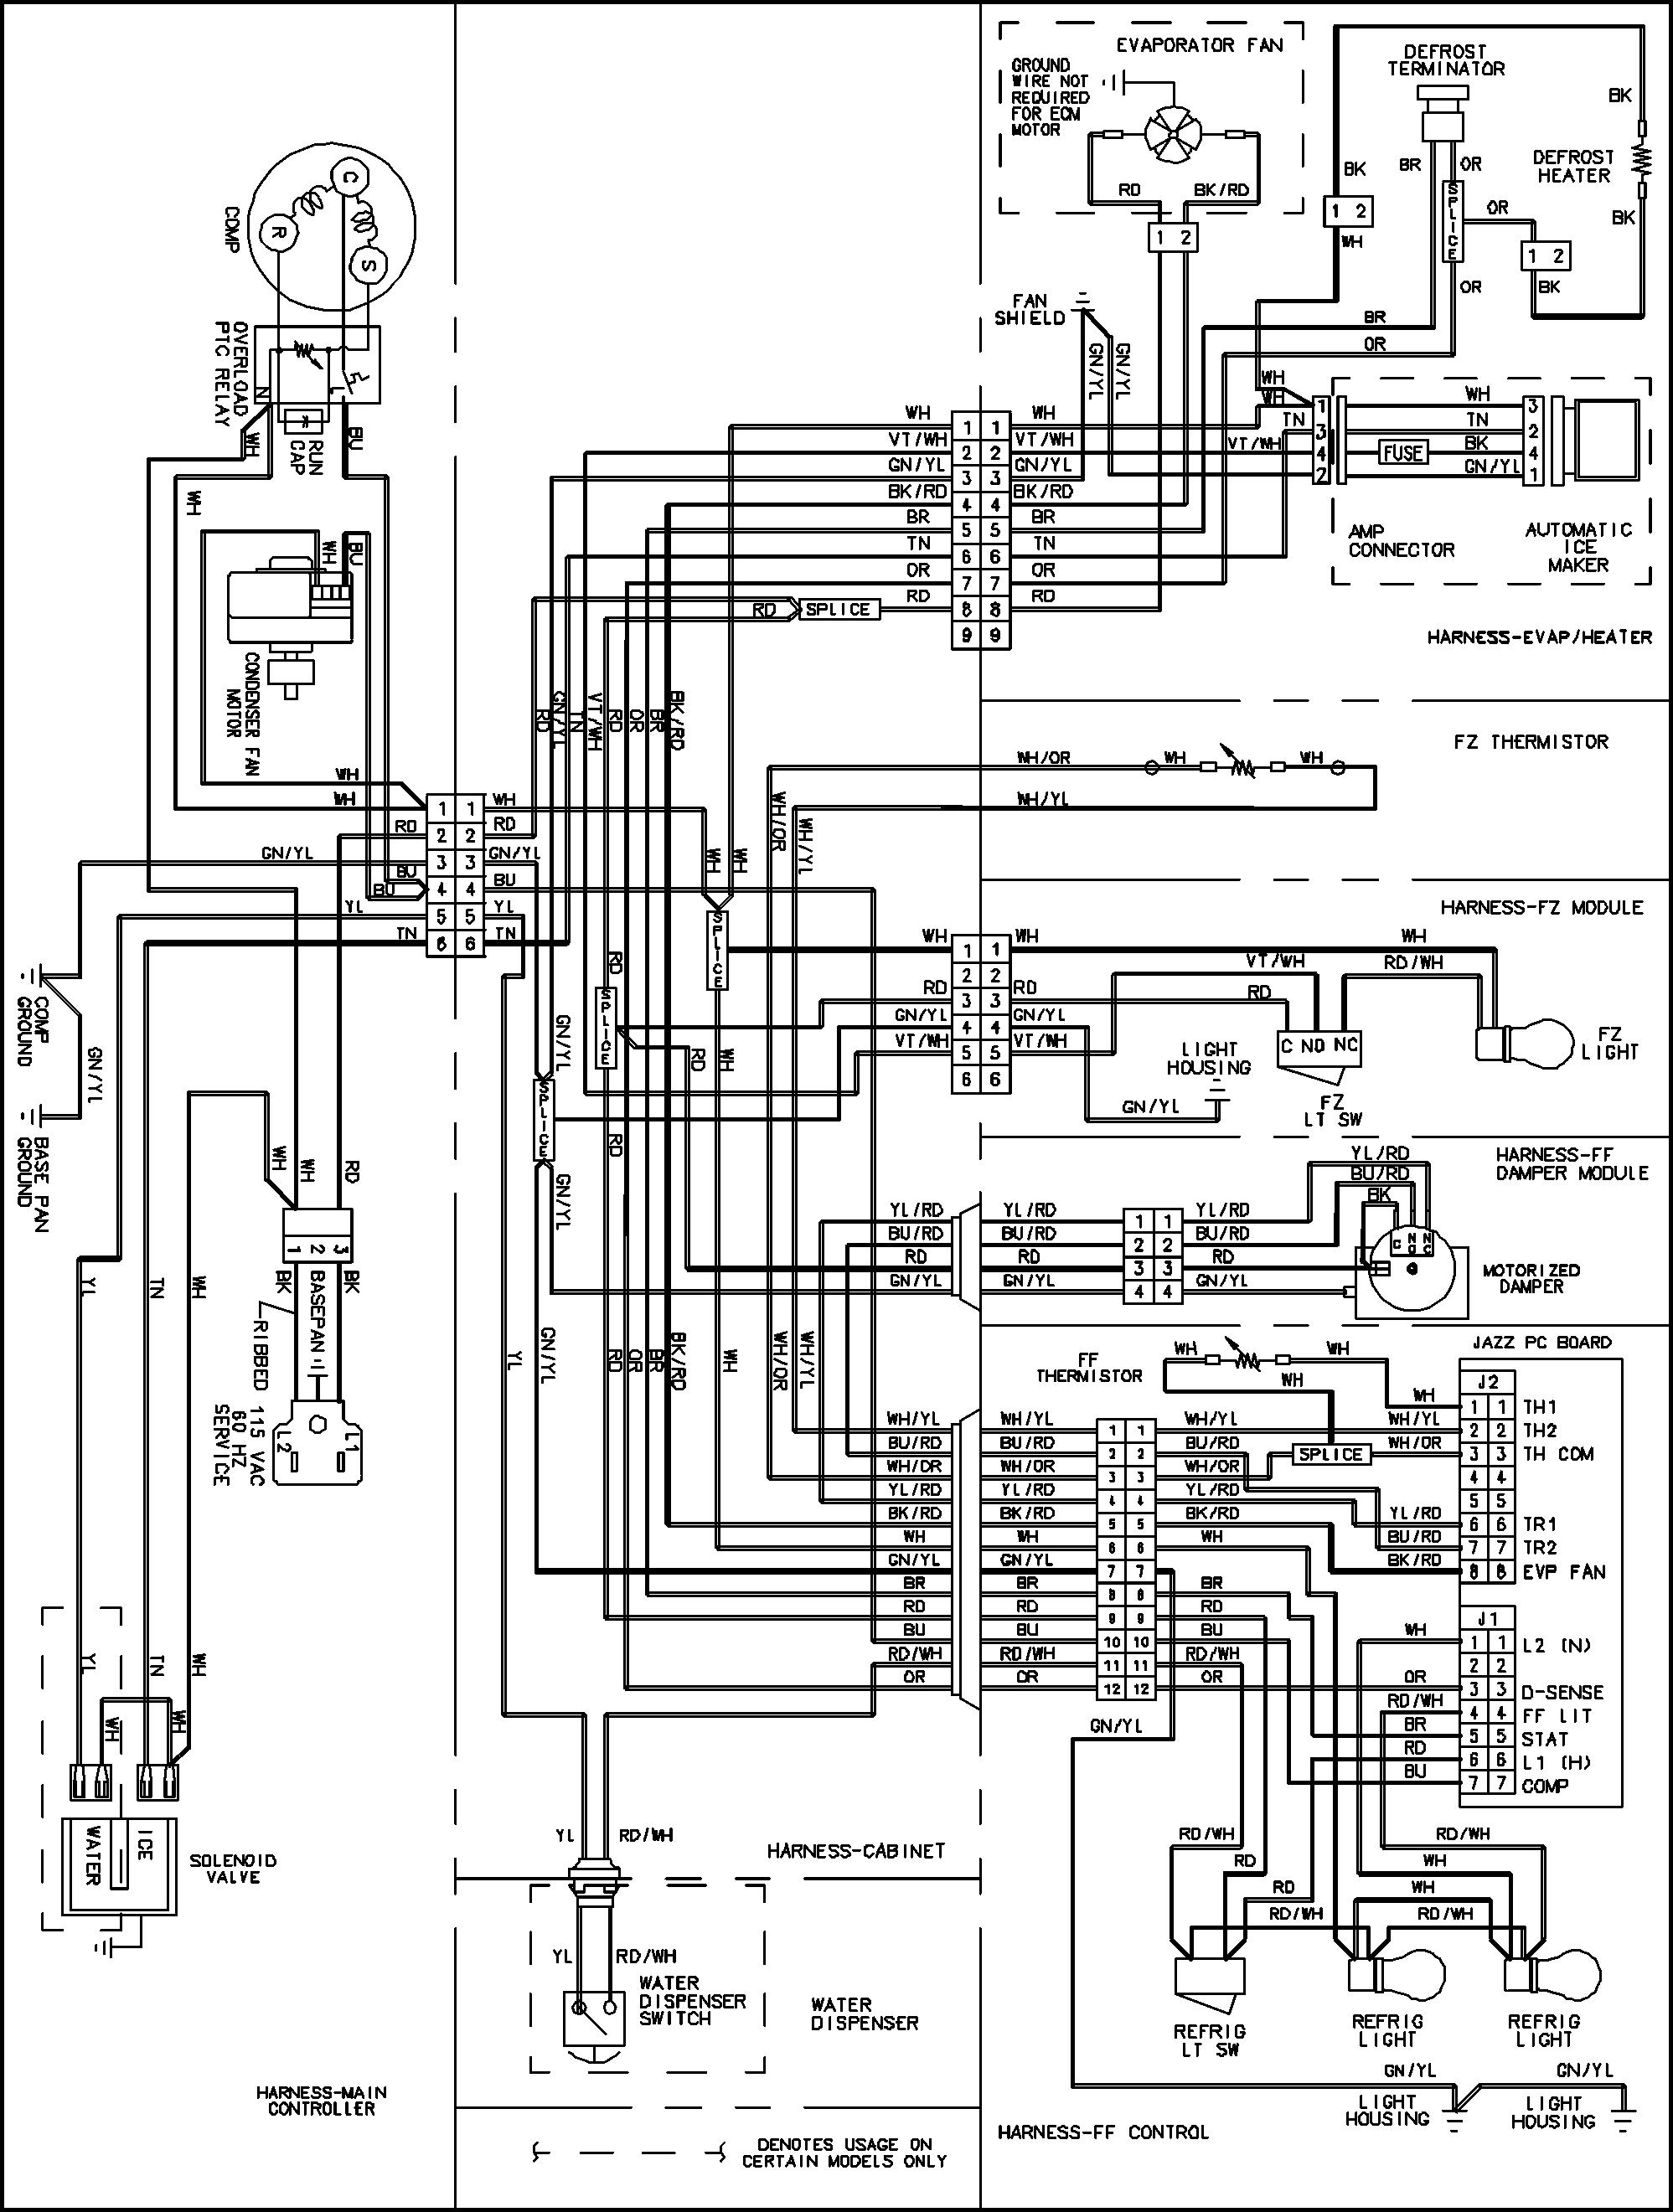 amana gas dryer wiring diagrams amana wiring diagrams wiring diagram e6  amana wiring diagrams wiring diagram e6